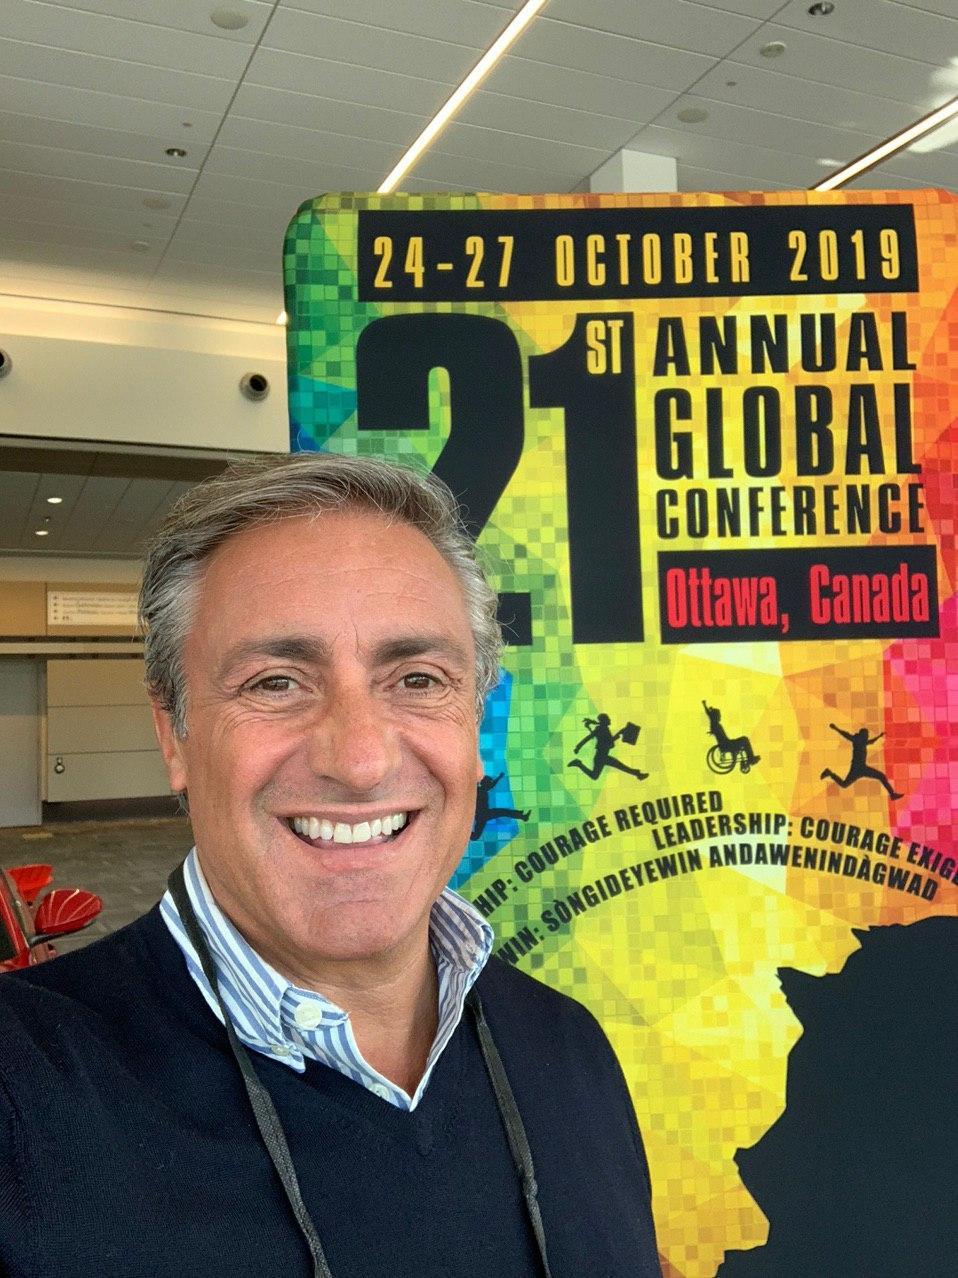 Congreso de la Asociación internacional de liderazgo - Ottawa Canadá